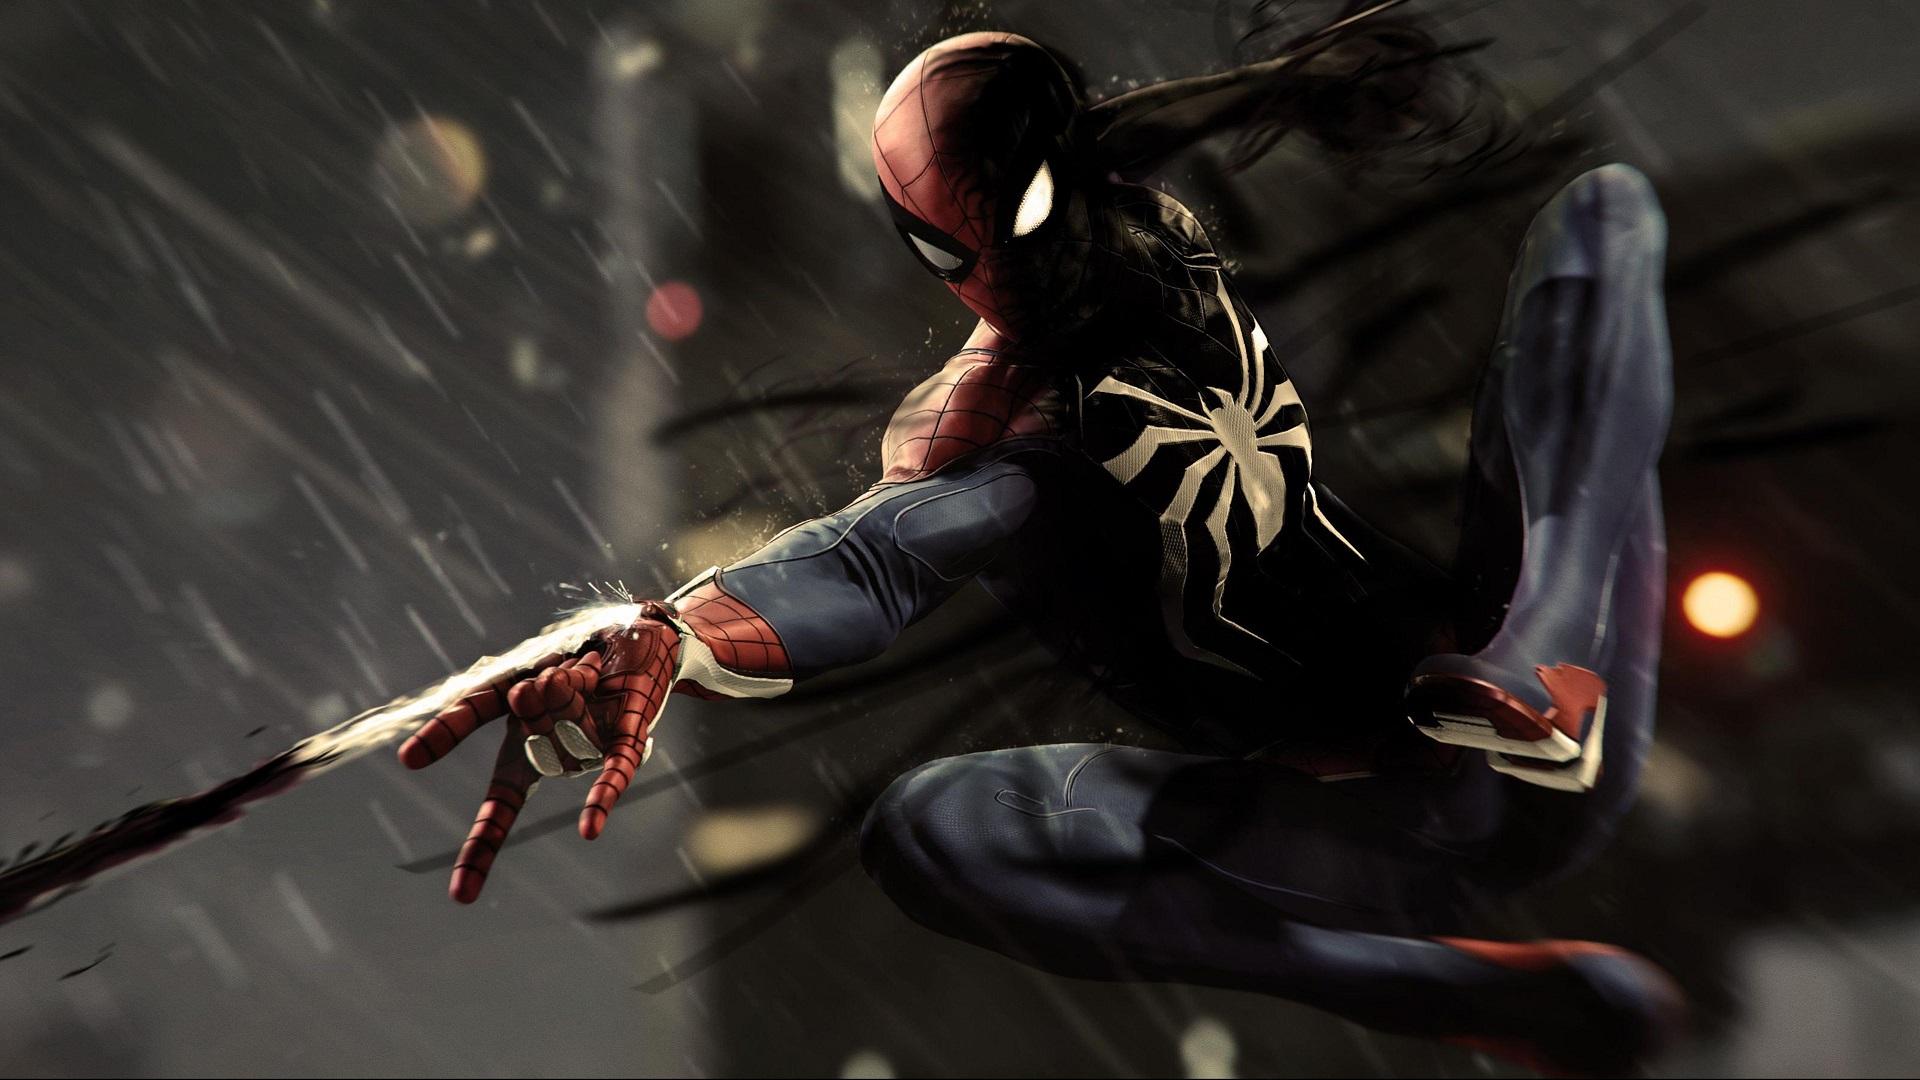 General 1920x1080 Spider-Man superhero Marvel Comics